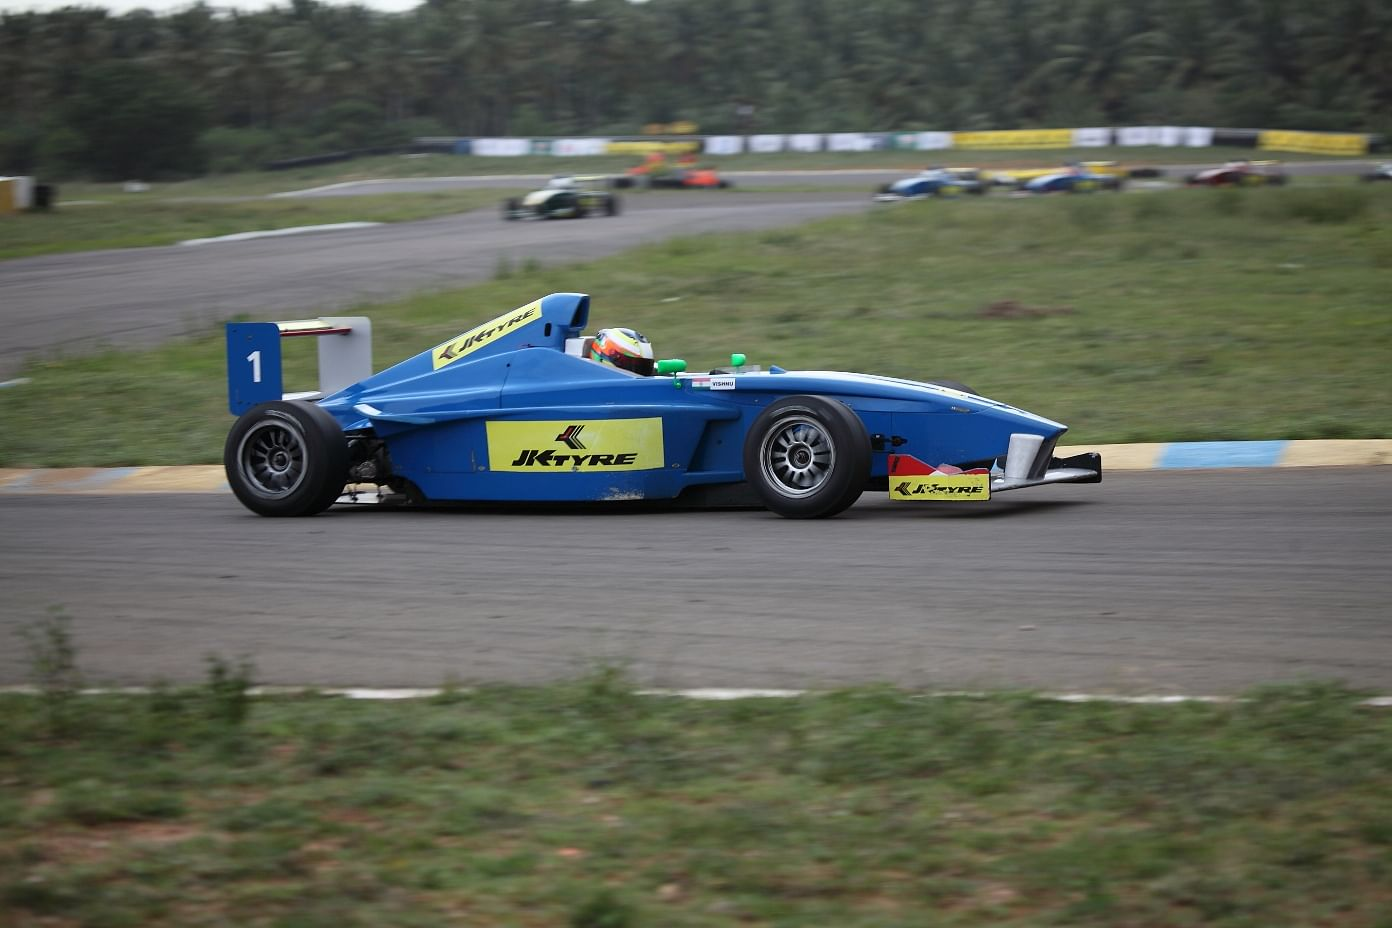 Jk Tyre Racing Bright Start For Vishnu Prasad In Round 2